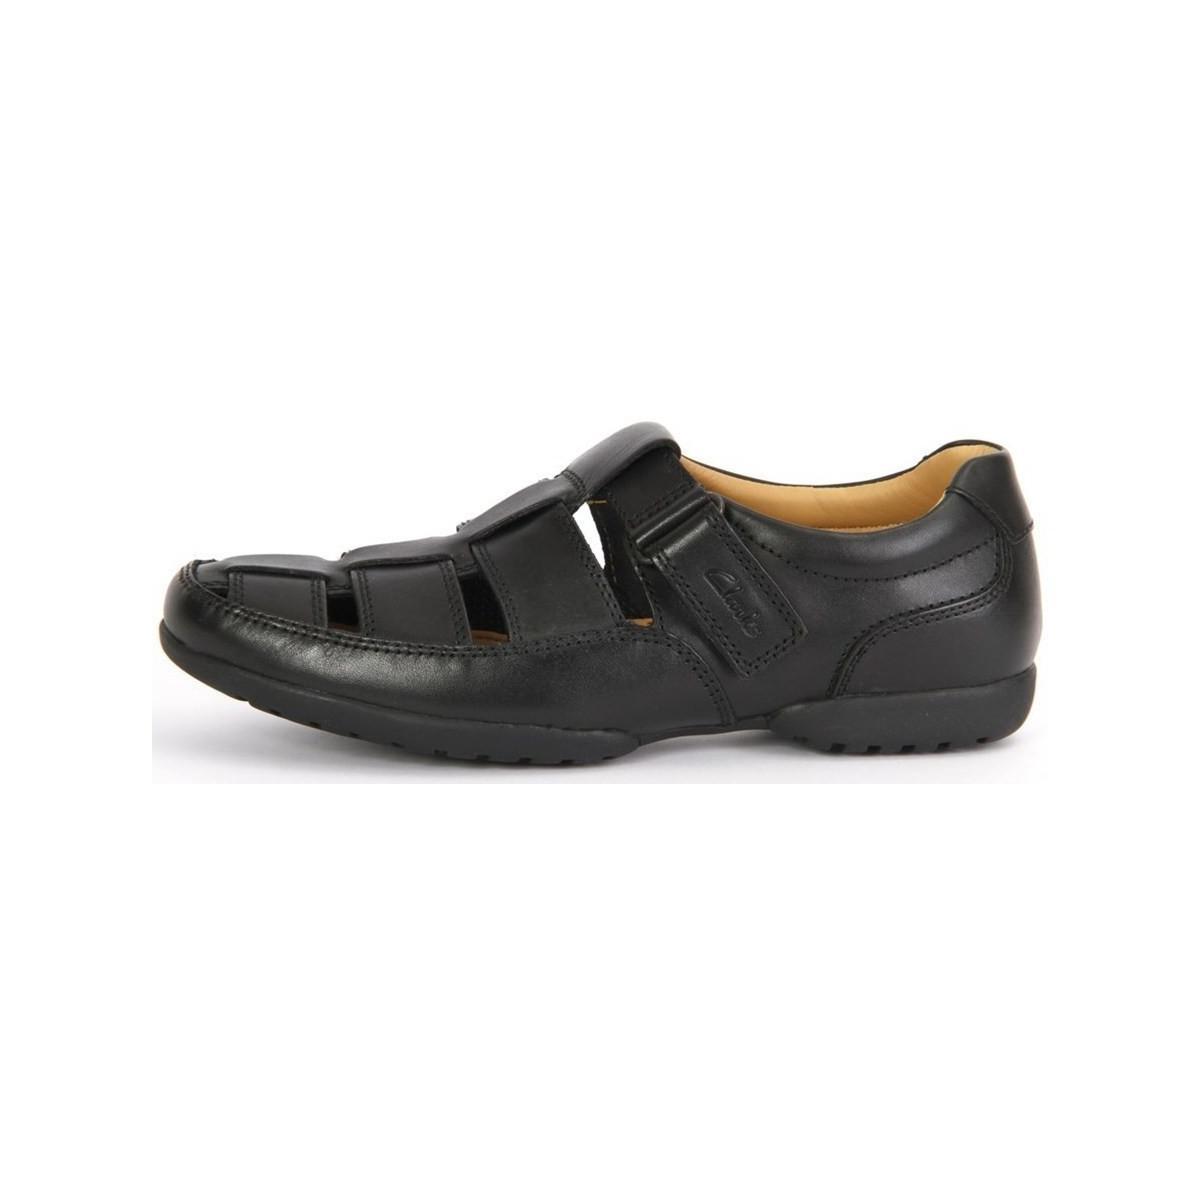 9ddb0ca8e Clarks Recline Open Black Leather Men's Sandals In Black in Black ...